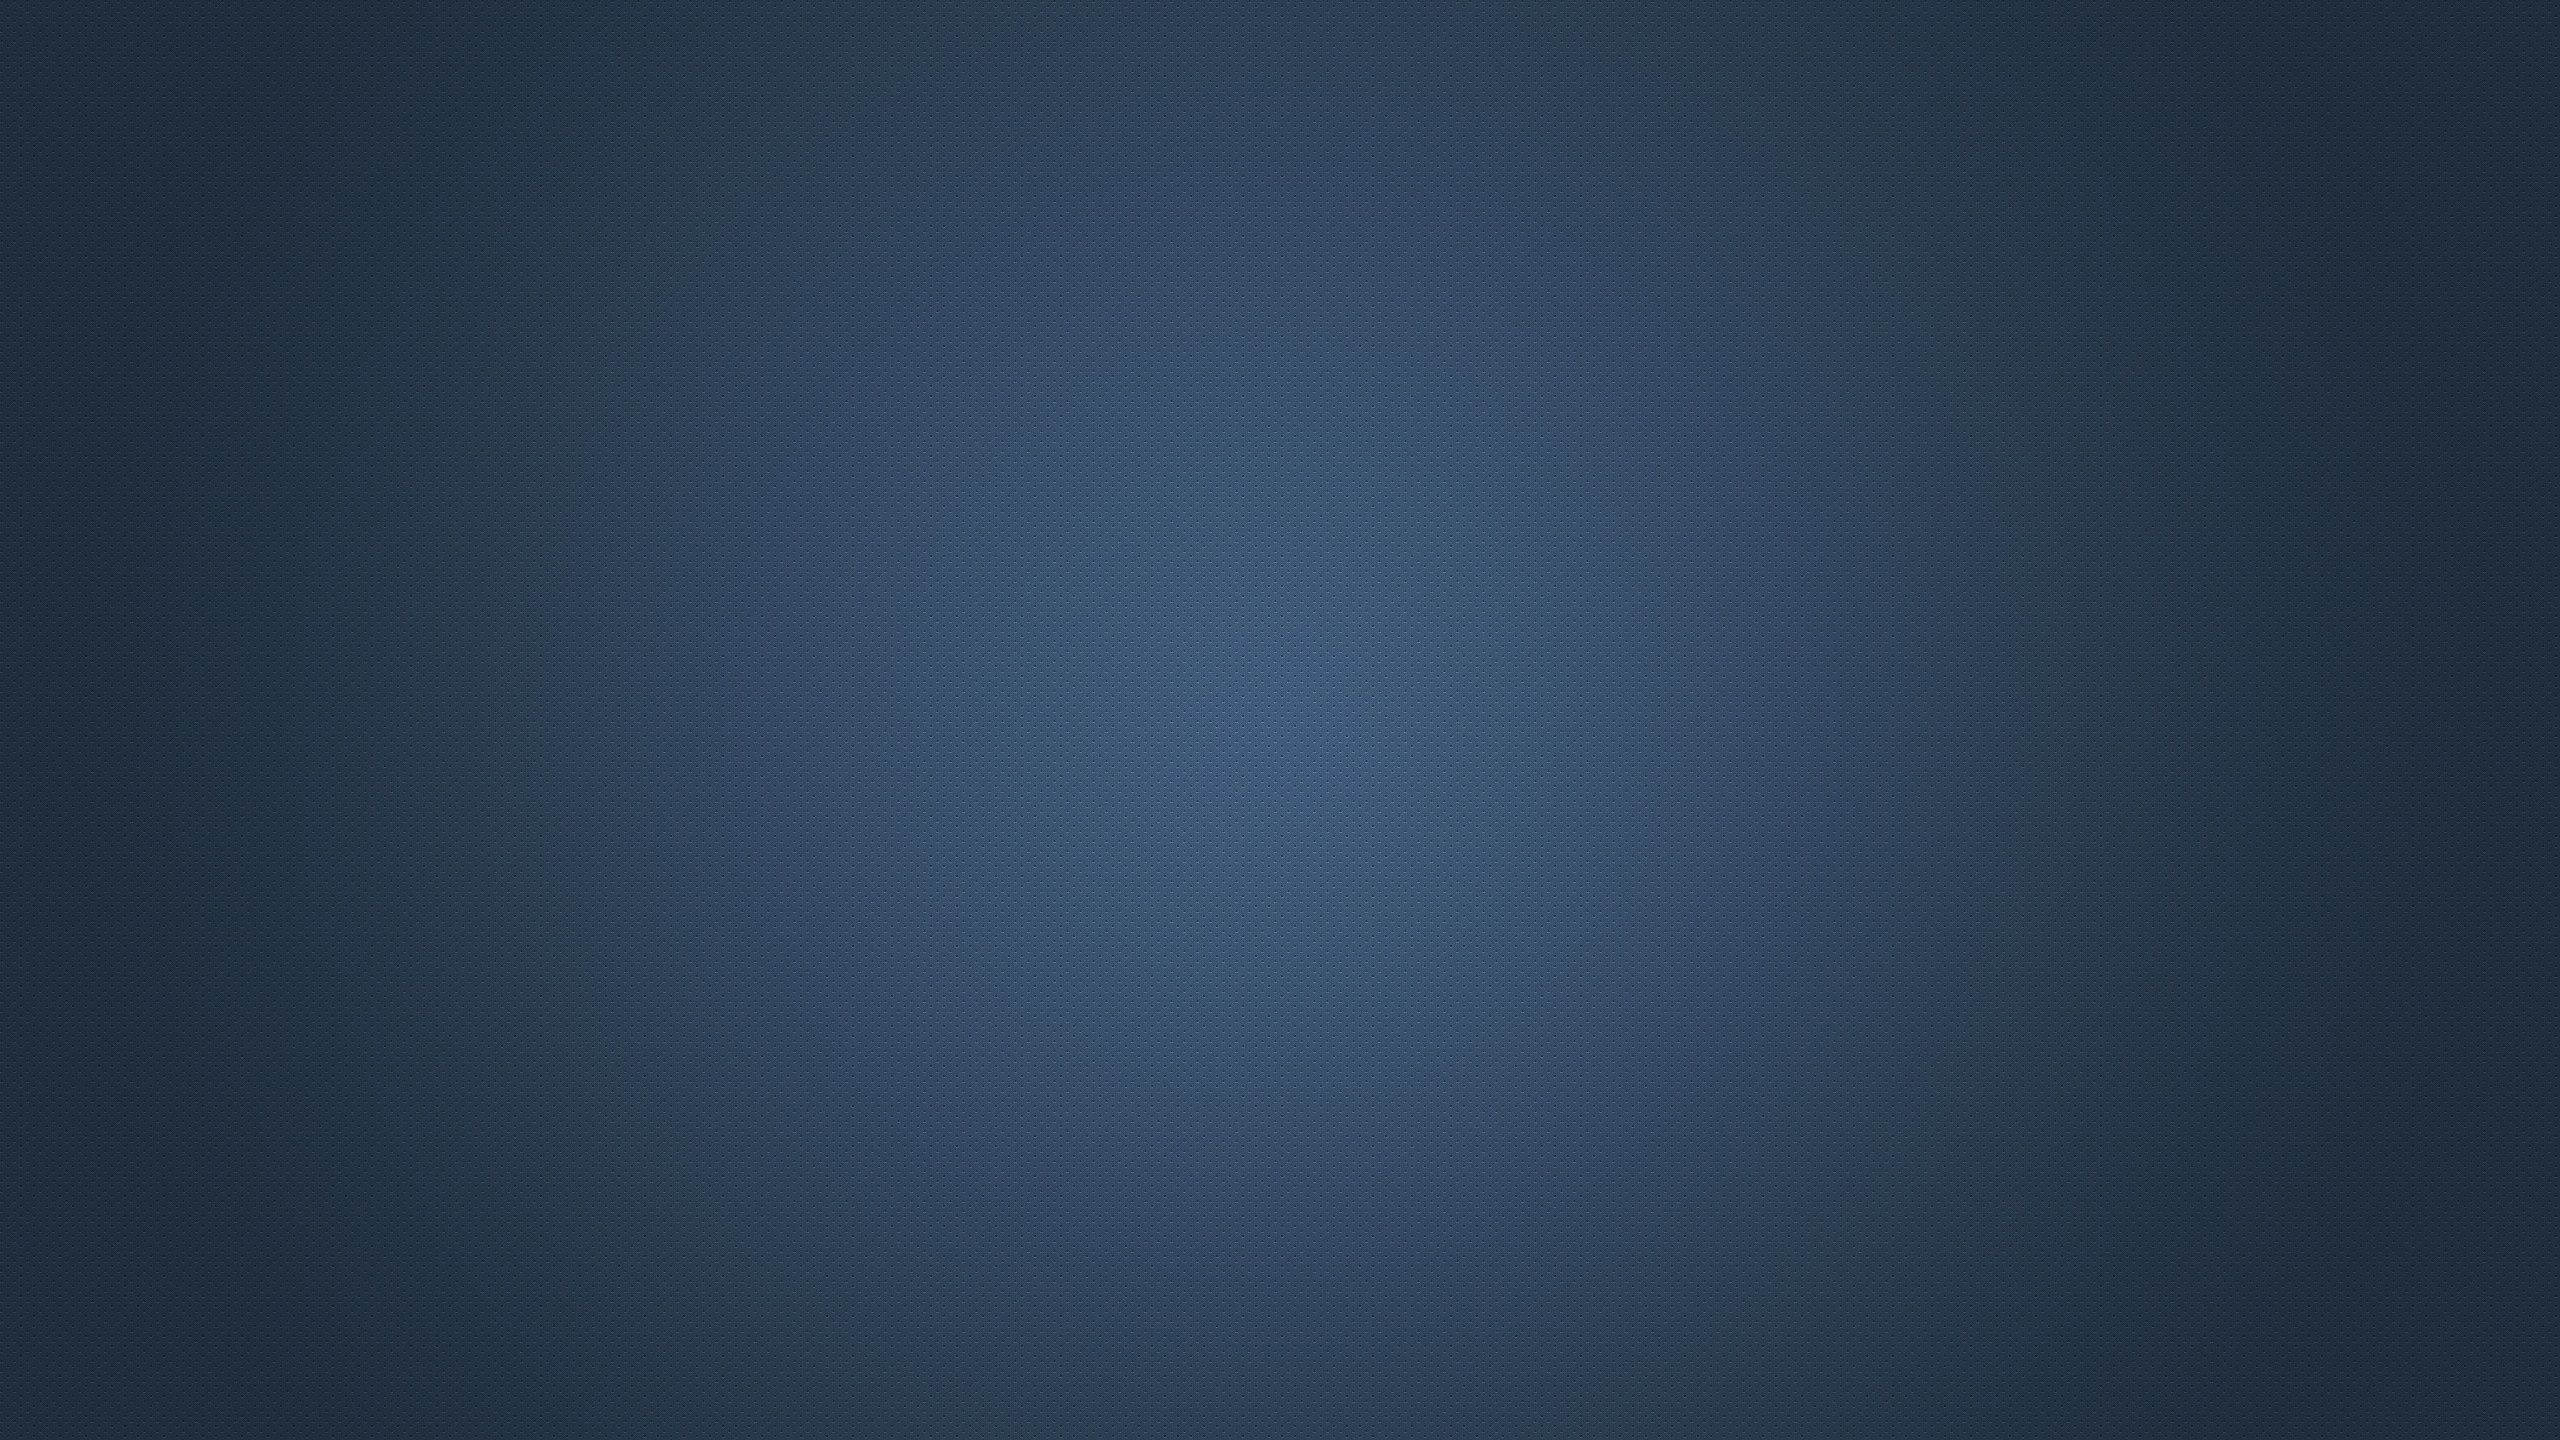 Dark Blue Pattern Desktop Pc And Mac Wallpaper Data Src Darkness 2856050 Hd Wallpaper Backgrounds Download